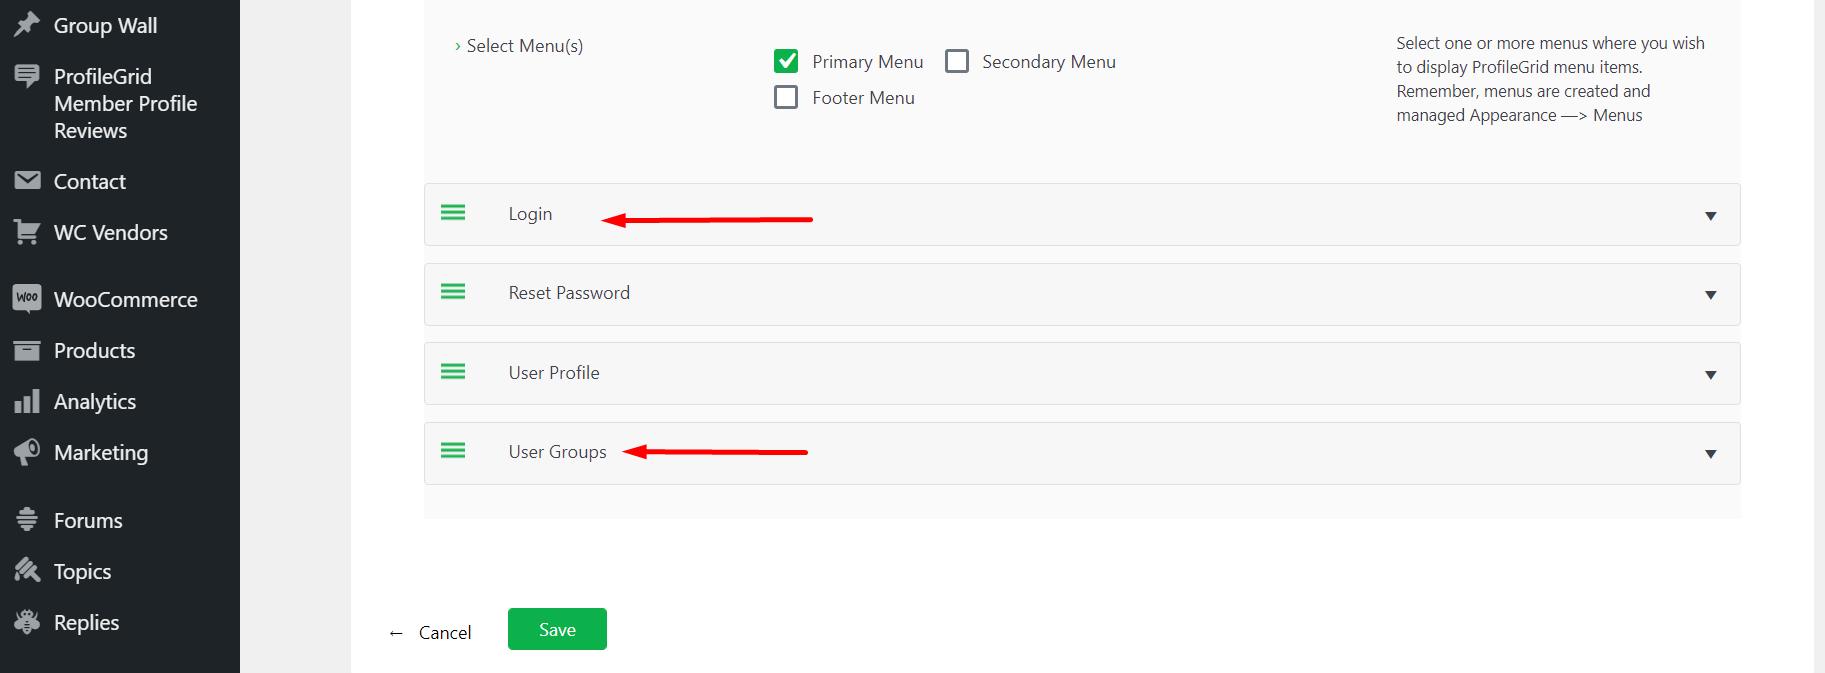 ProfileGrid Menu Integration Settings